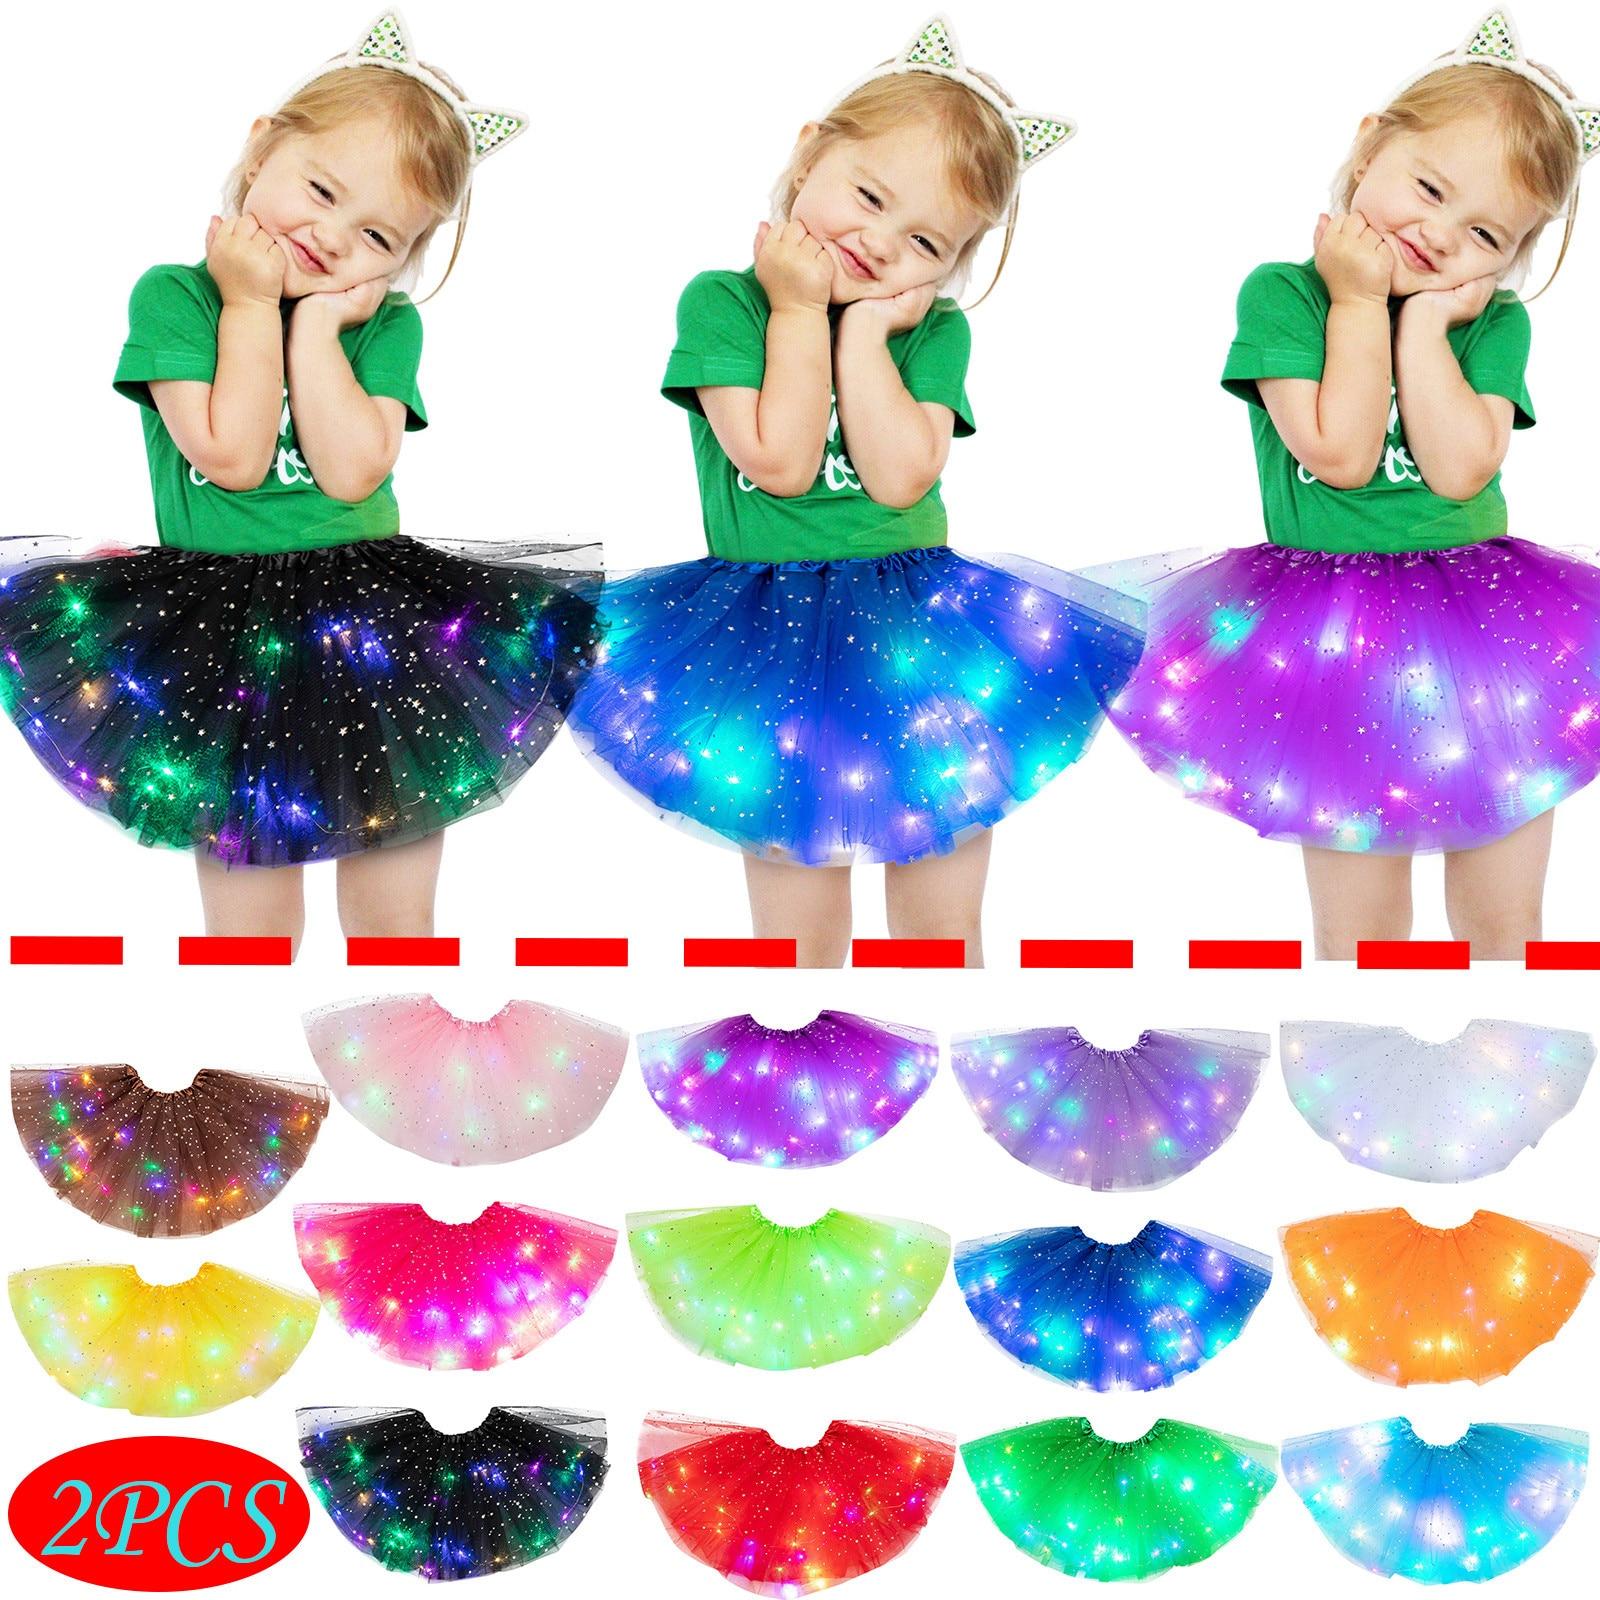 2 pçs meninas tutu saia led brilhante luz crianças meninas bebê lantejoulas led light up pettiskirt ballet roupas traje cosplay roupas